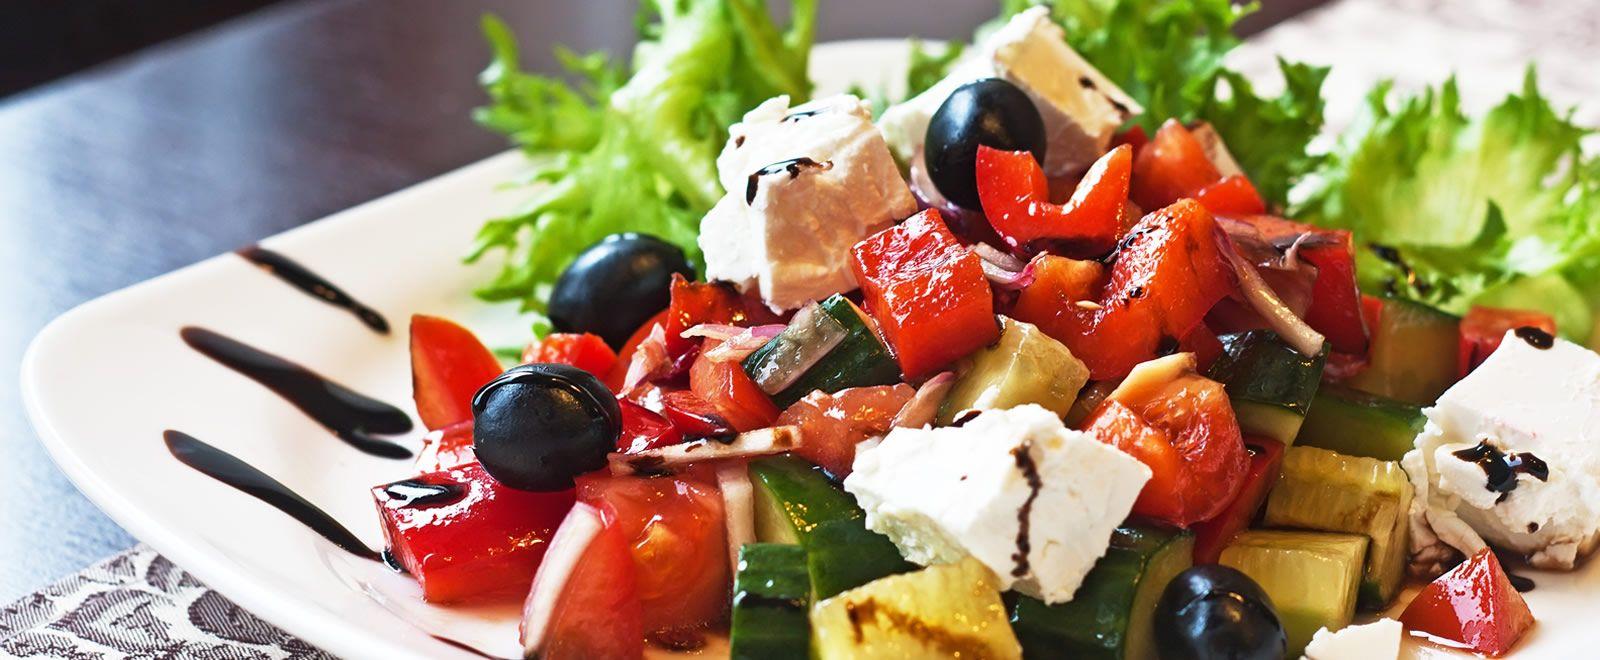 Recetas de ensaladas ligeras para adelgazar